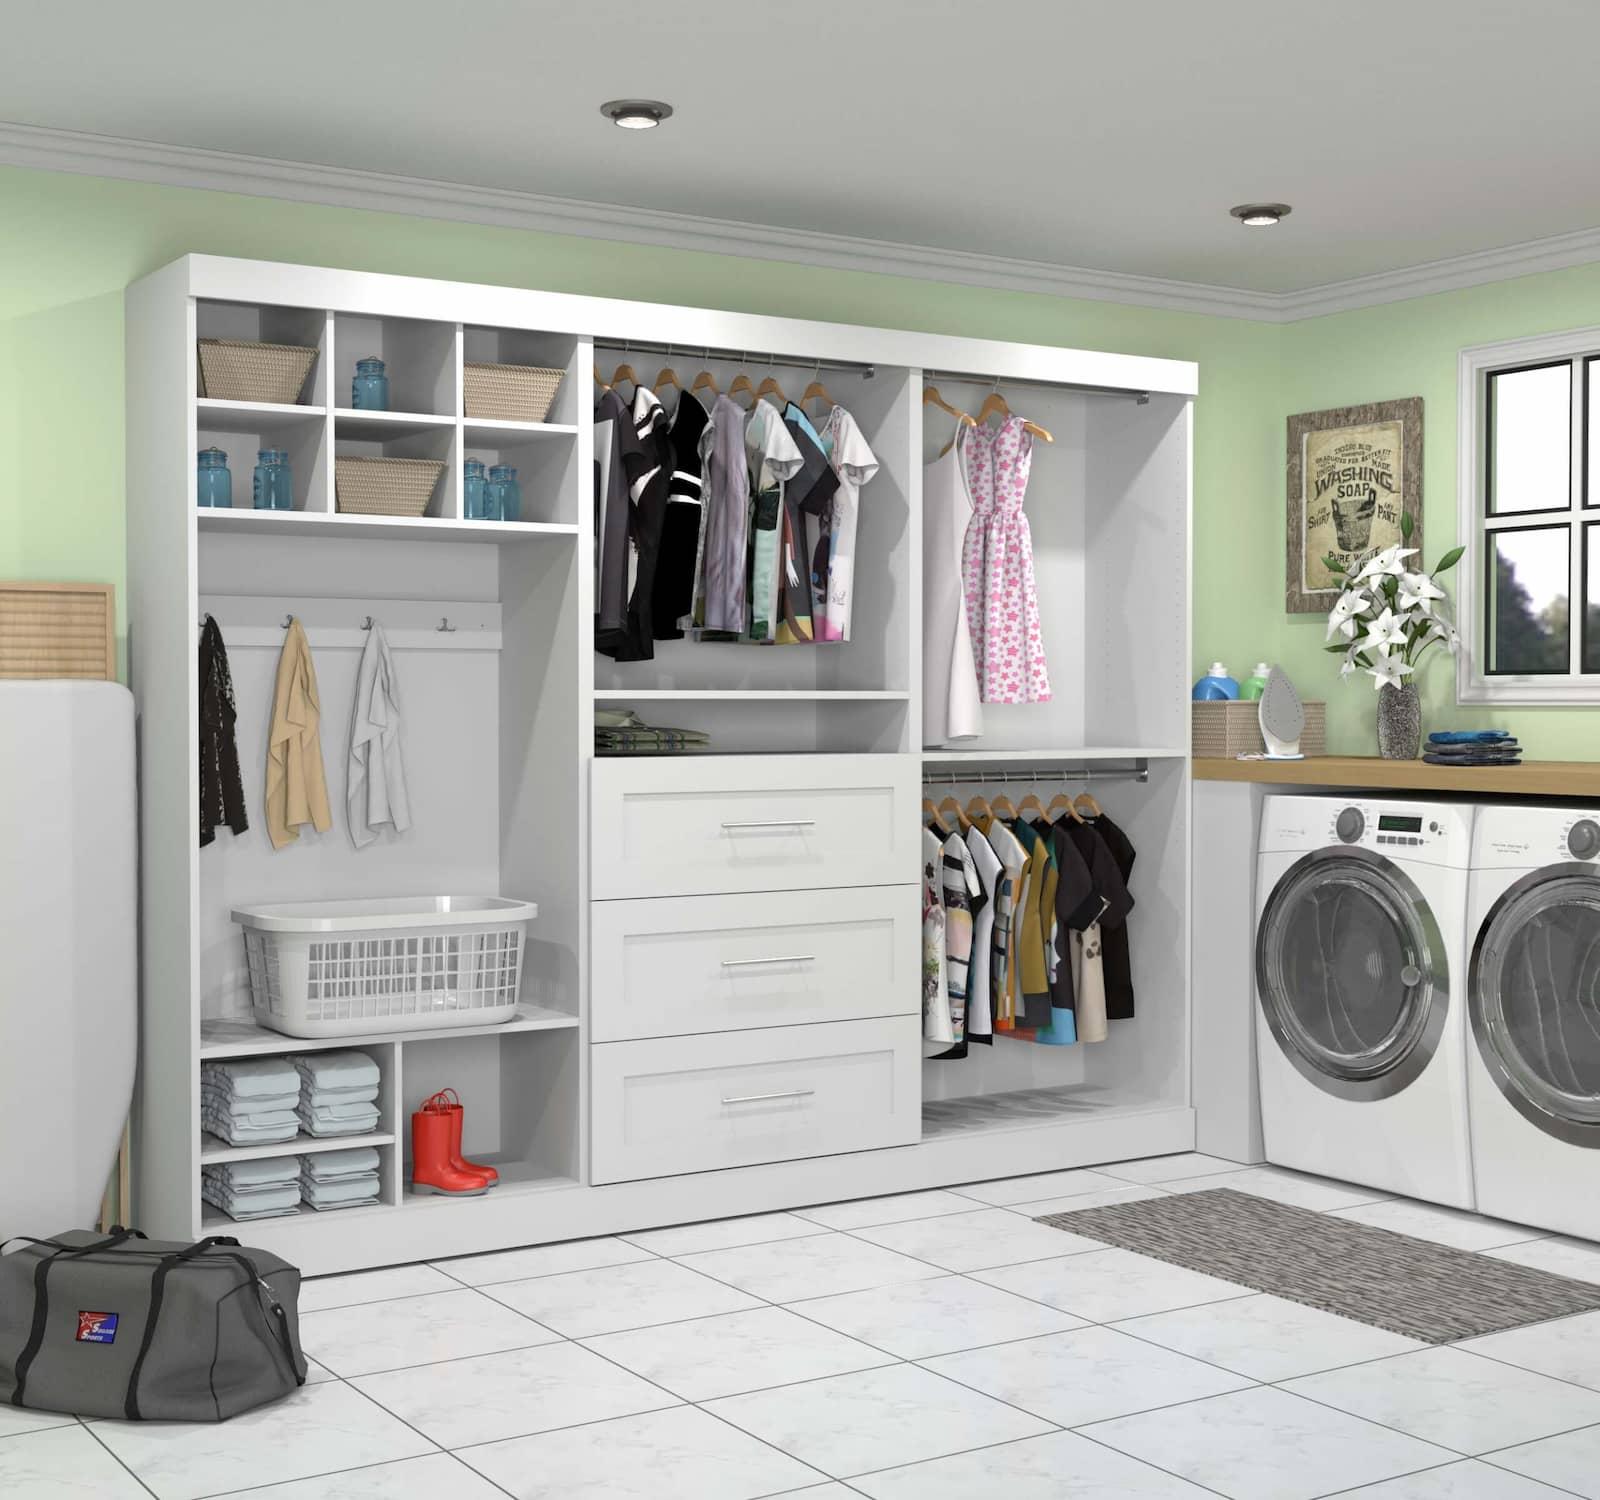 rangement de garde-robe dans la salle de lavage